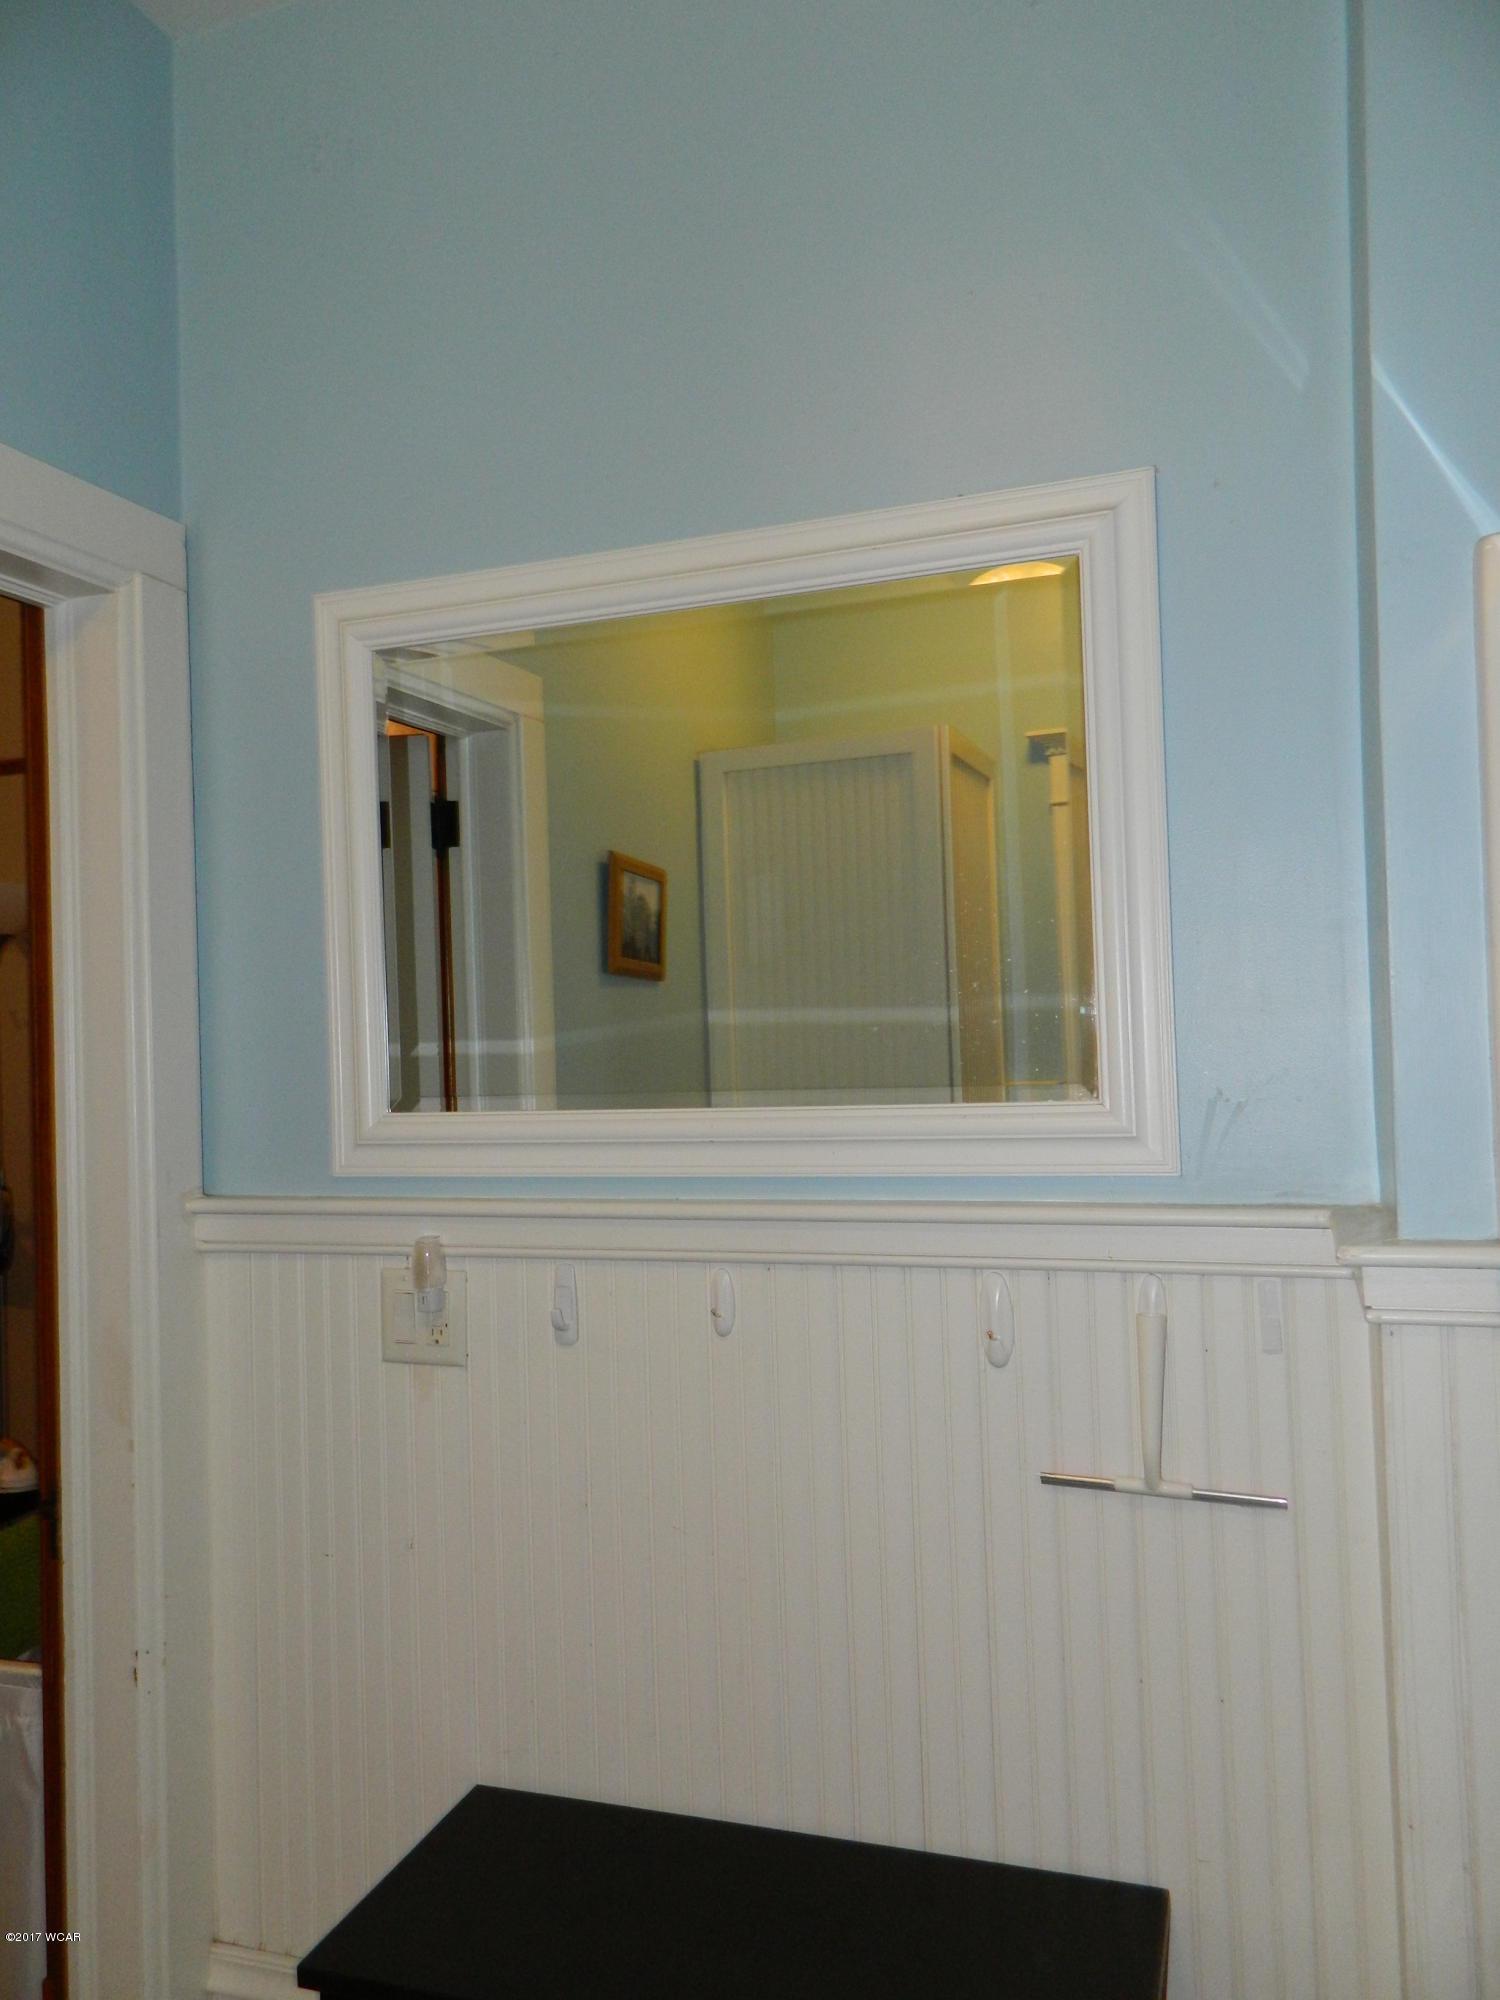 78994 160th Street,Sacred Heart,5 Bedrooms Bedrooms,2 BathroomsBathrooms,Single Family,160th Street,6025691